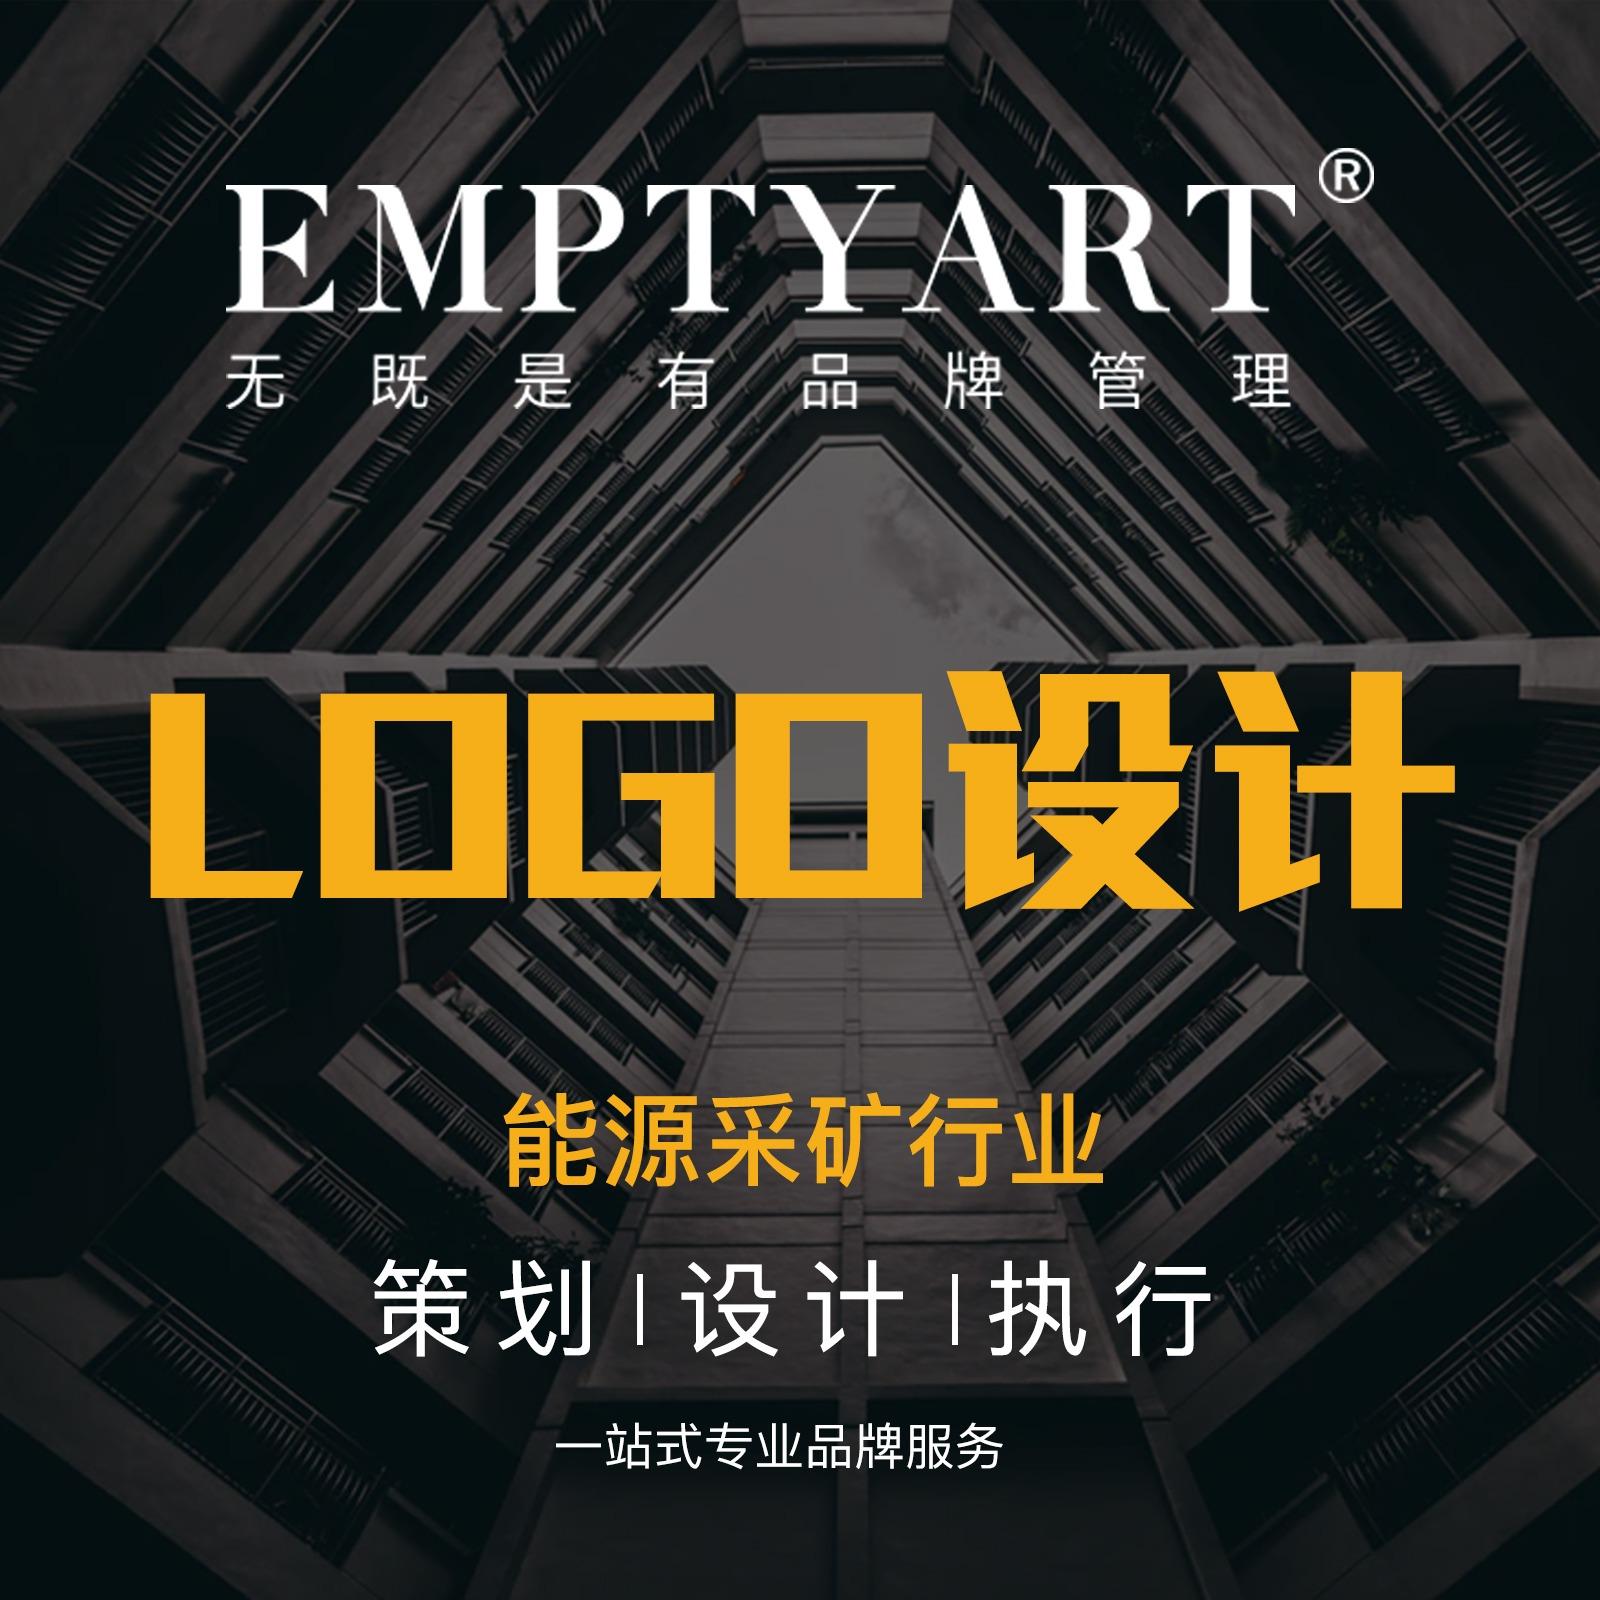 能源采矿行业品牌<hl>logo设计</hl>原创标志商标<hl>LOGO</hl>图标